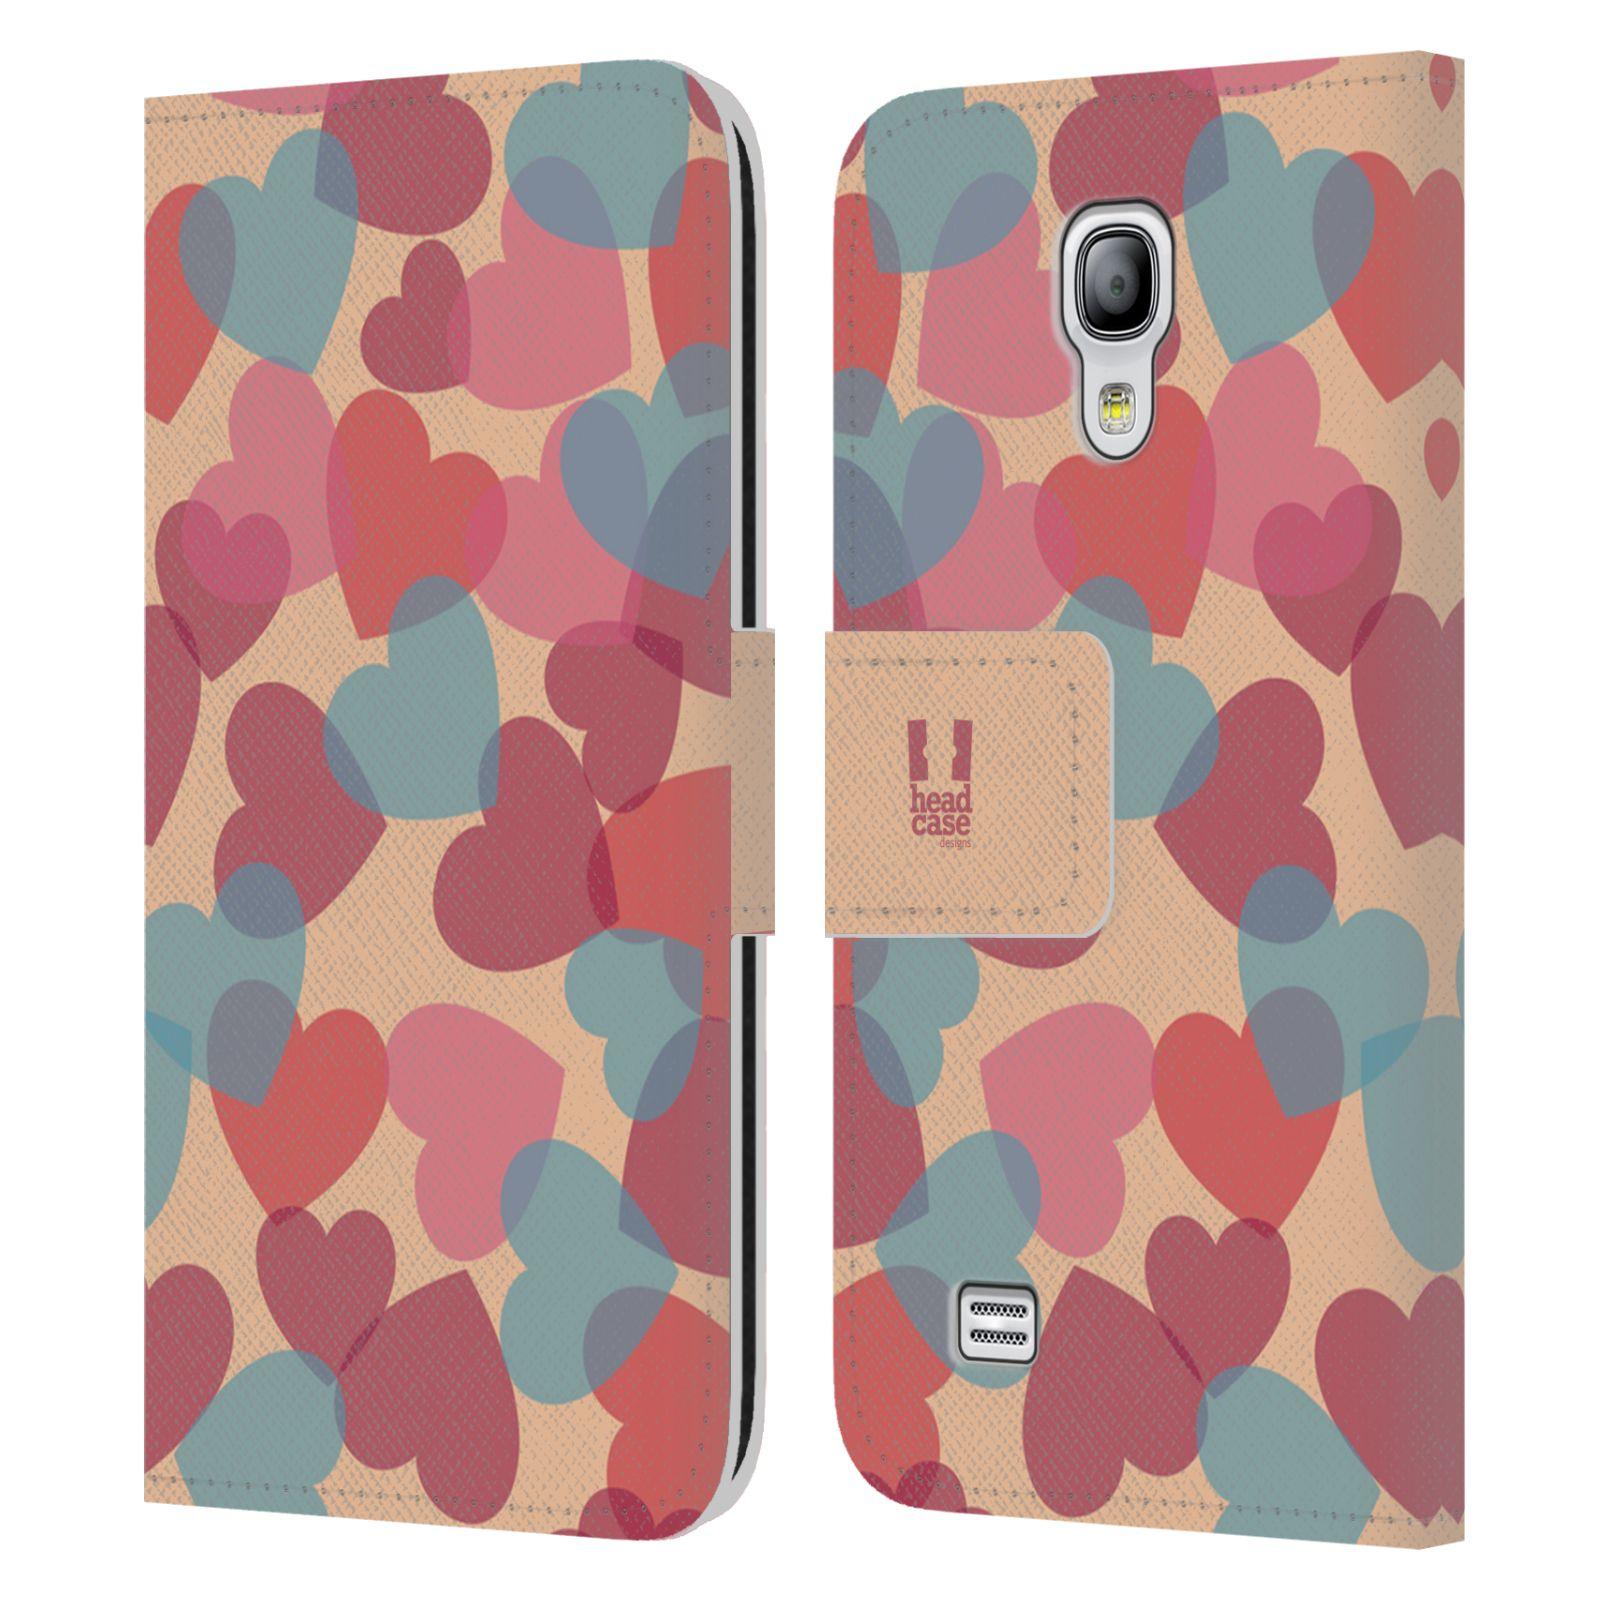 HEAD CASE Flipové pouzdro pro mobil Samsung Galaxy S4 MINI / S4 MINI DUOS vzor prolínající se srdíčka, srdce, láska, růžová